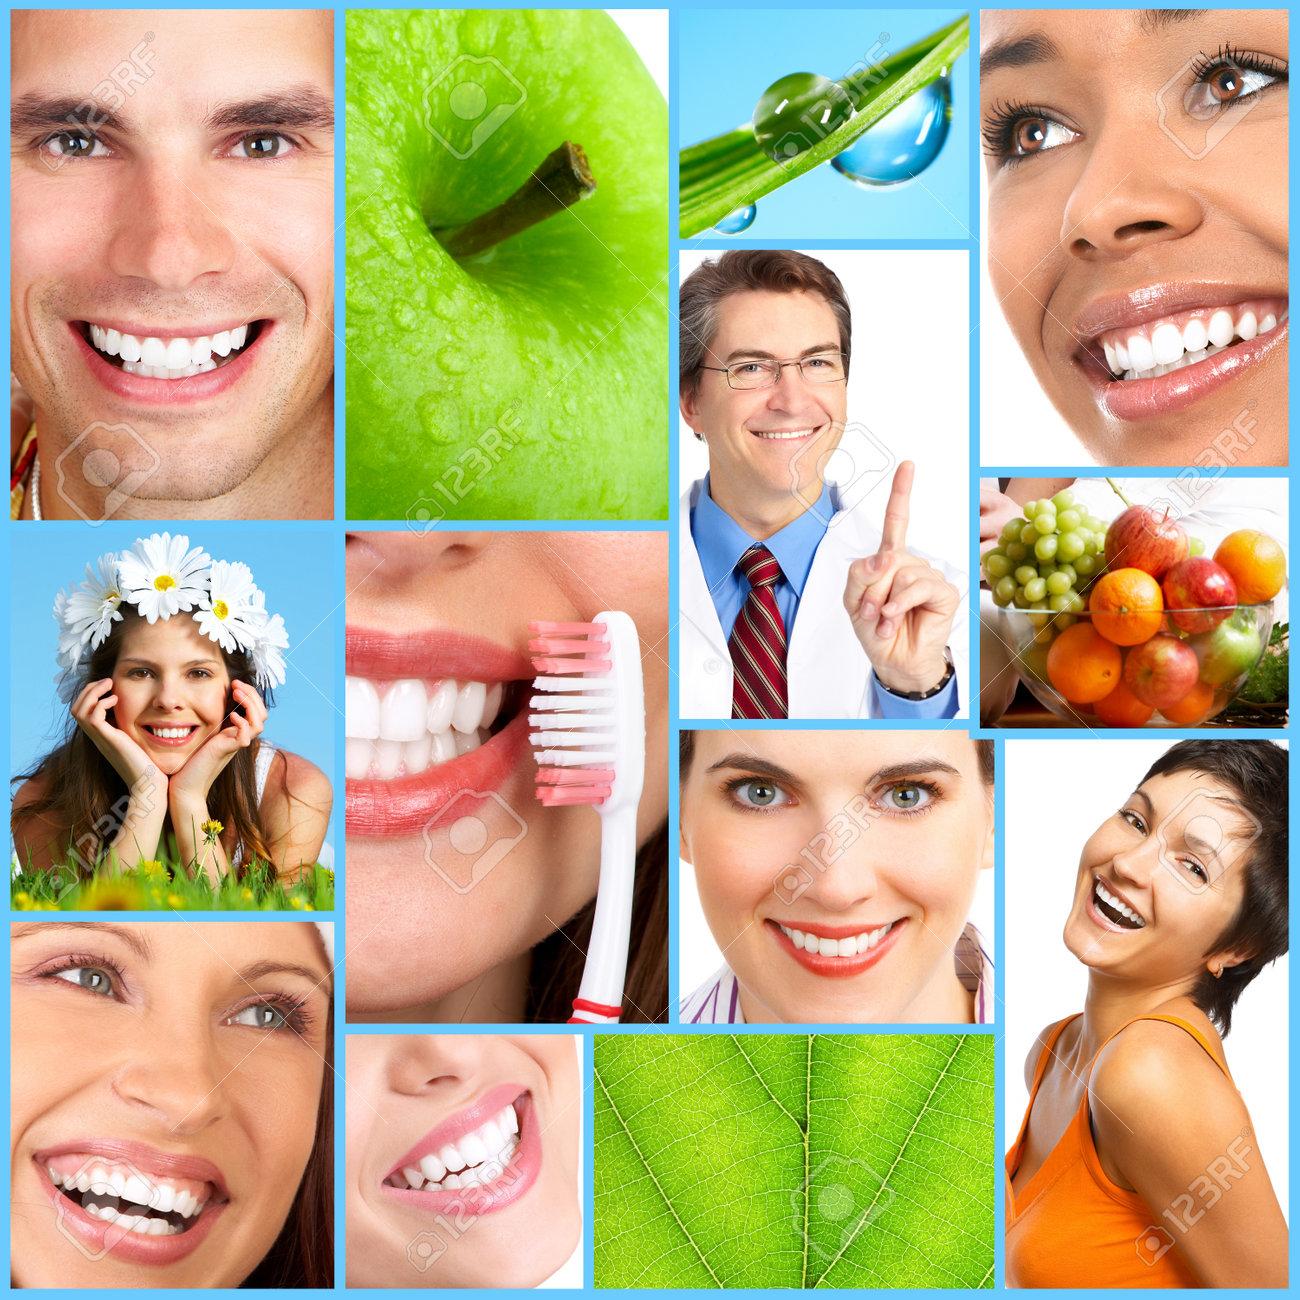 Dentist Medical Doctor Dentist Medical Doctor